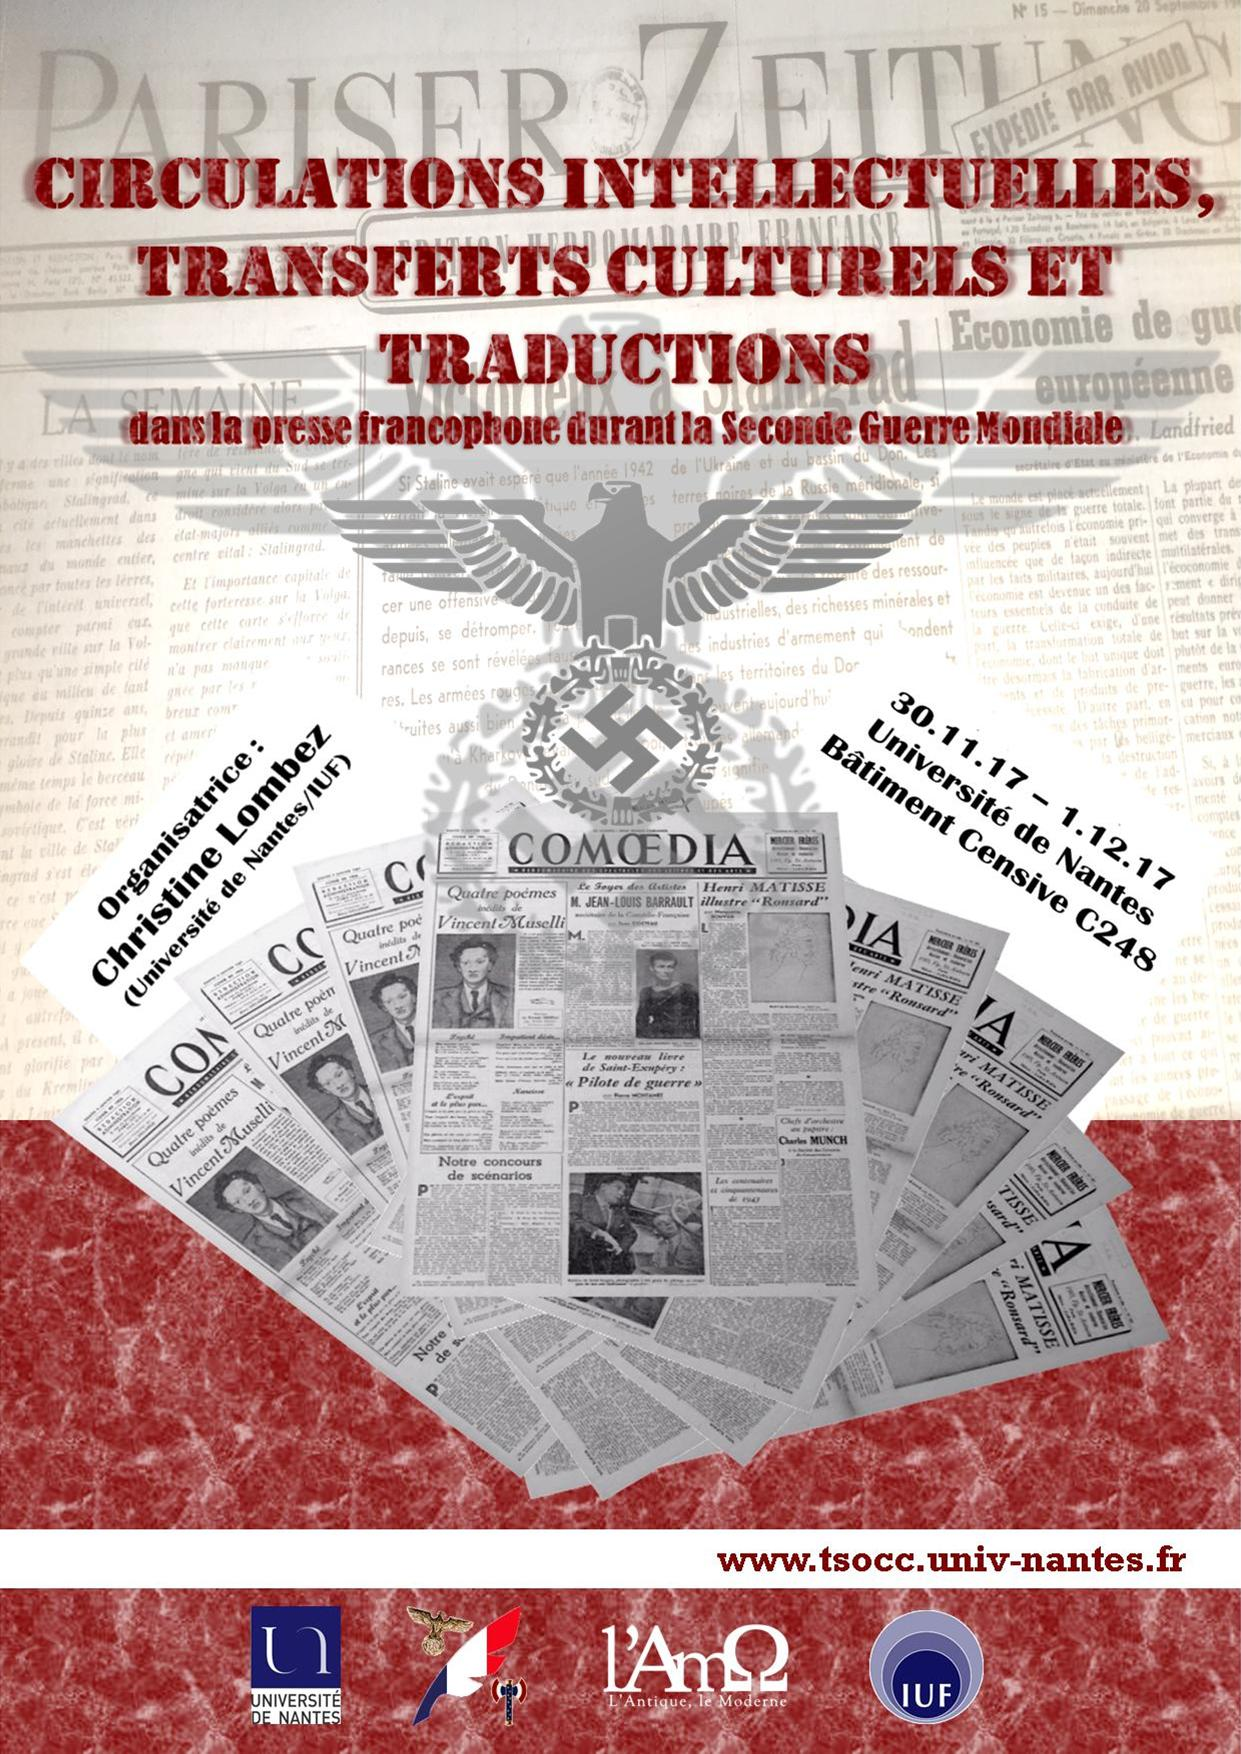 Circulations intellectuelles, transferts culturels et traductions dans l'espace francophone durant la Seconde Guerre Mondiale (Nantes)